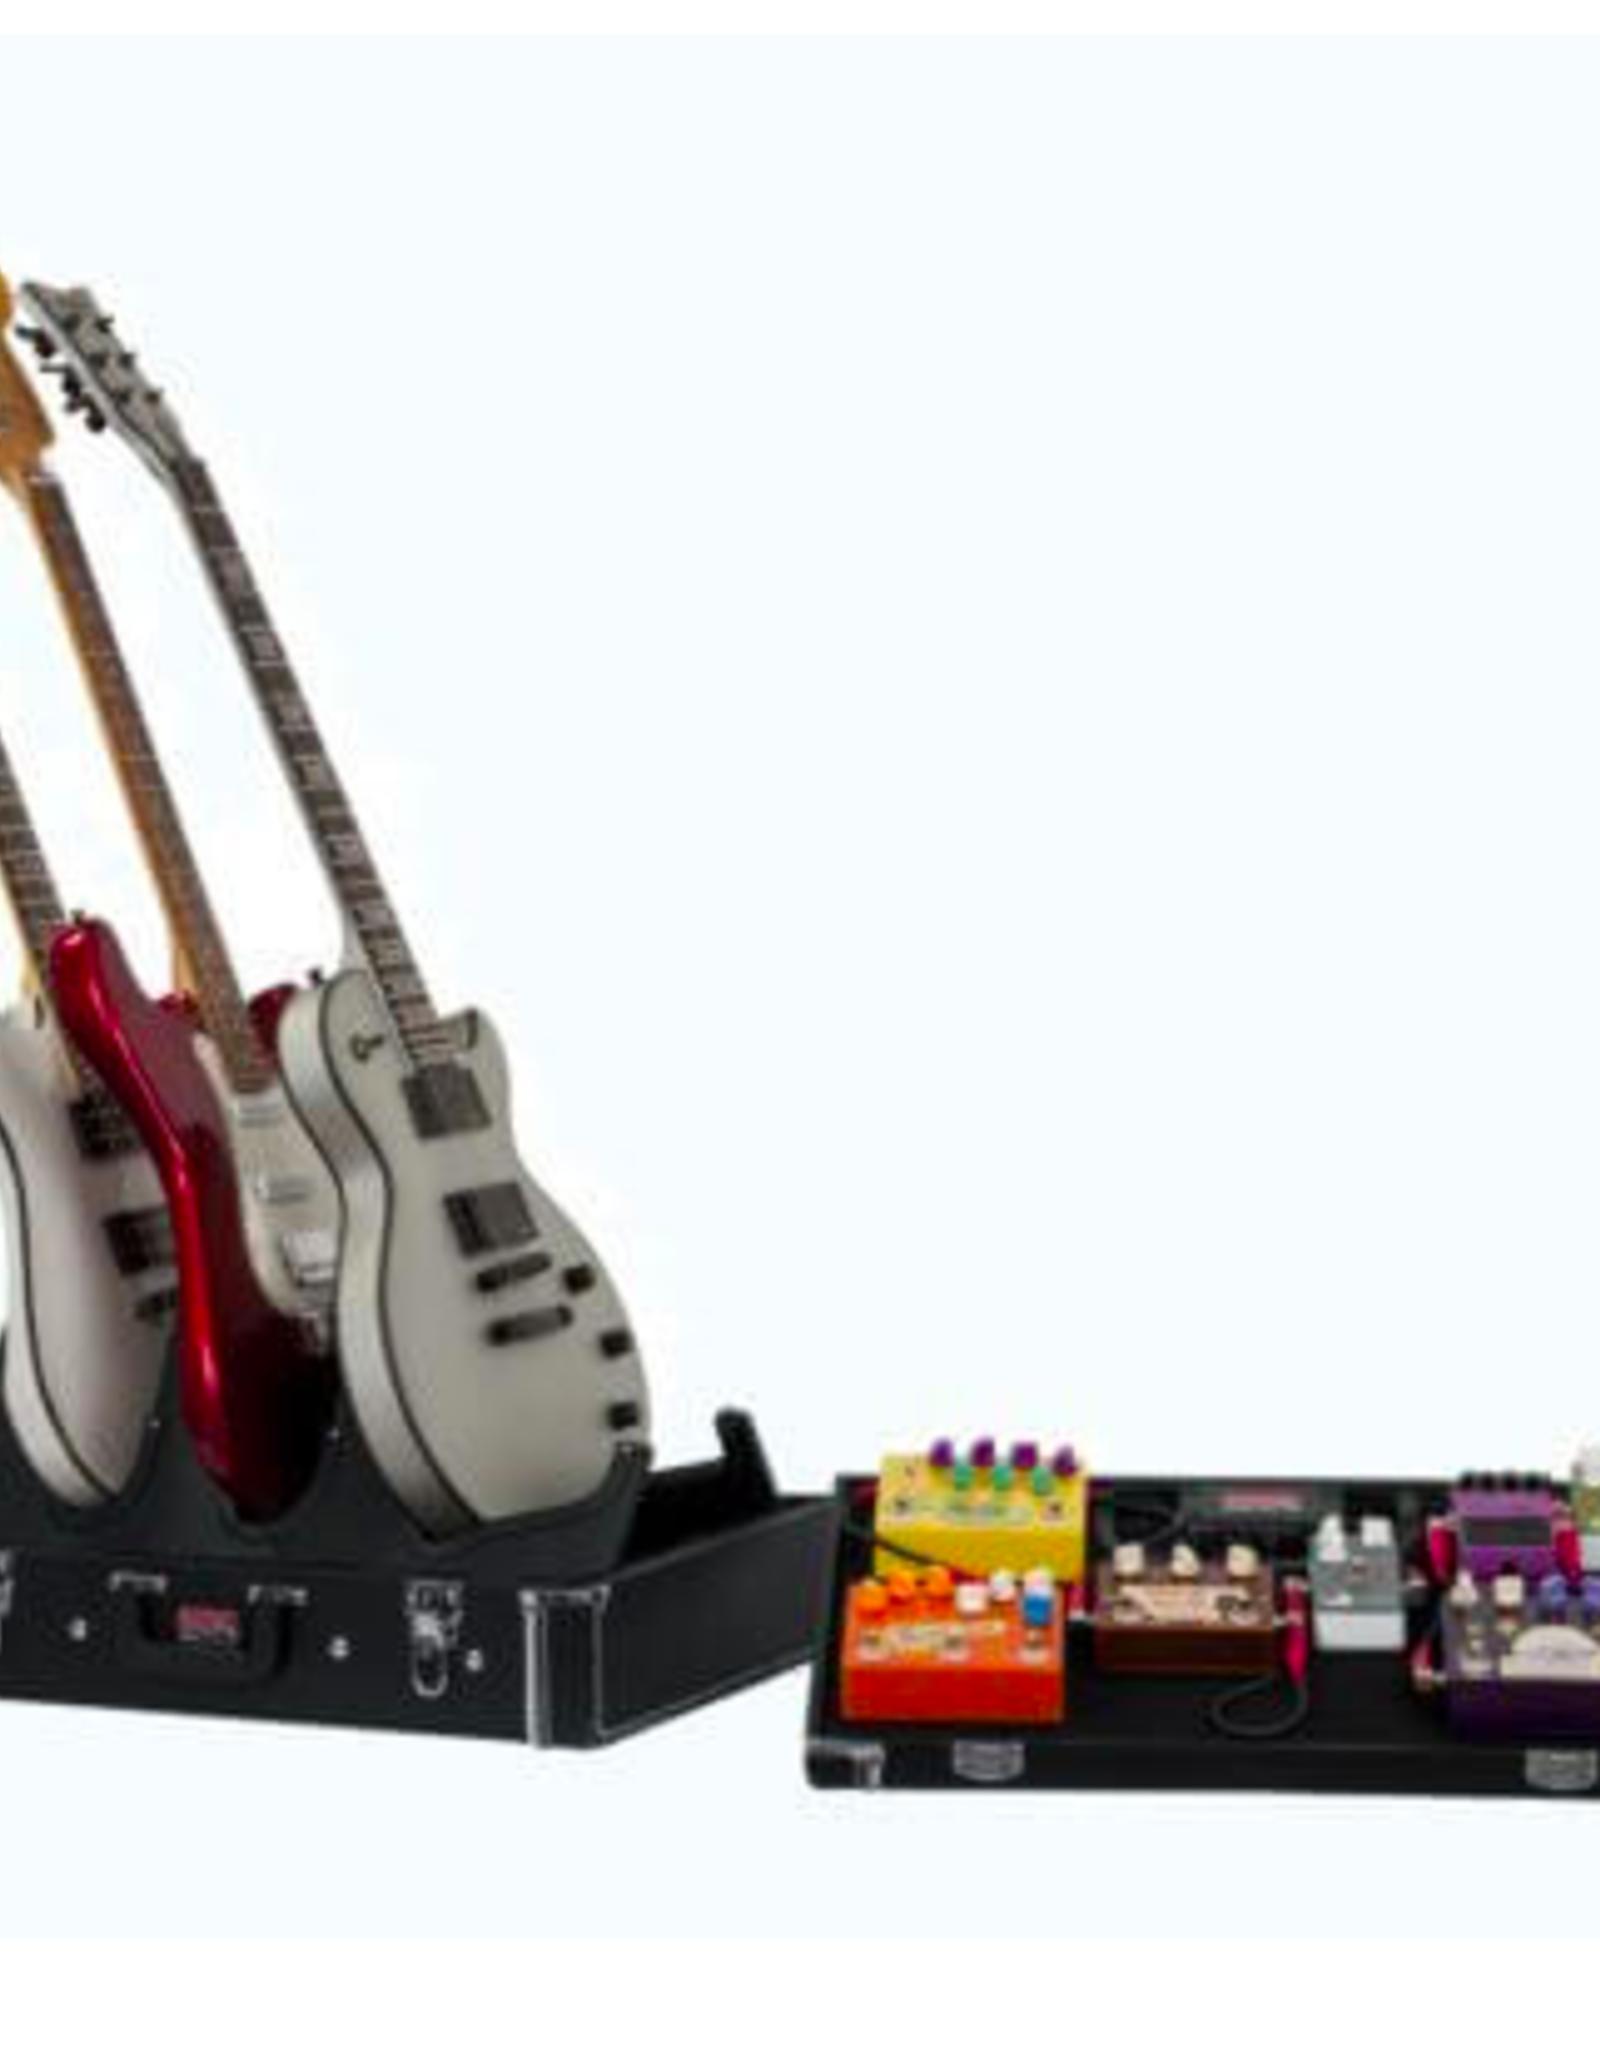 Gator Gig Box Series Pedal Board/Guitar Stand Case, Jr w/Power